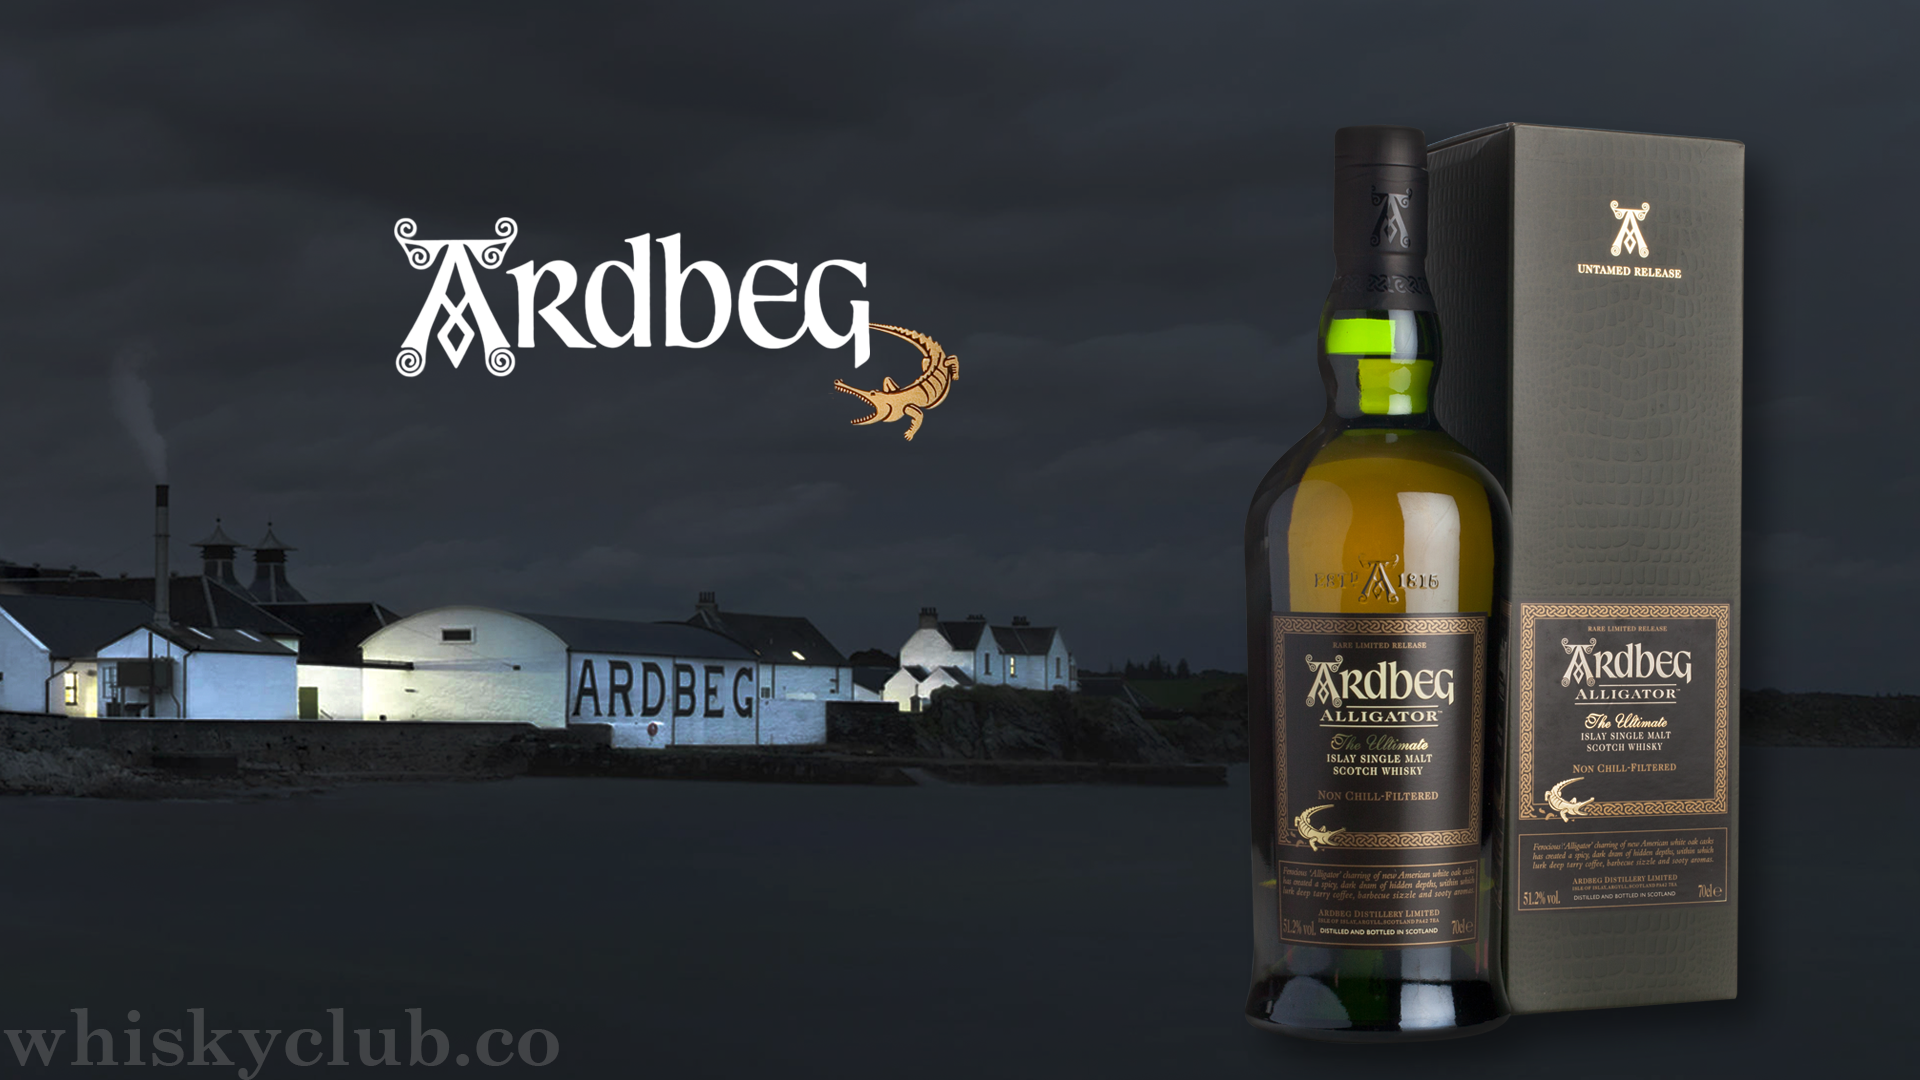 Виски ардбег: история, особенности, обзор вкуса и видов